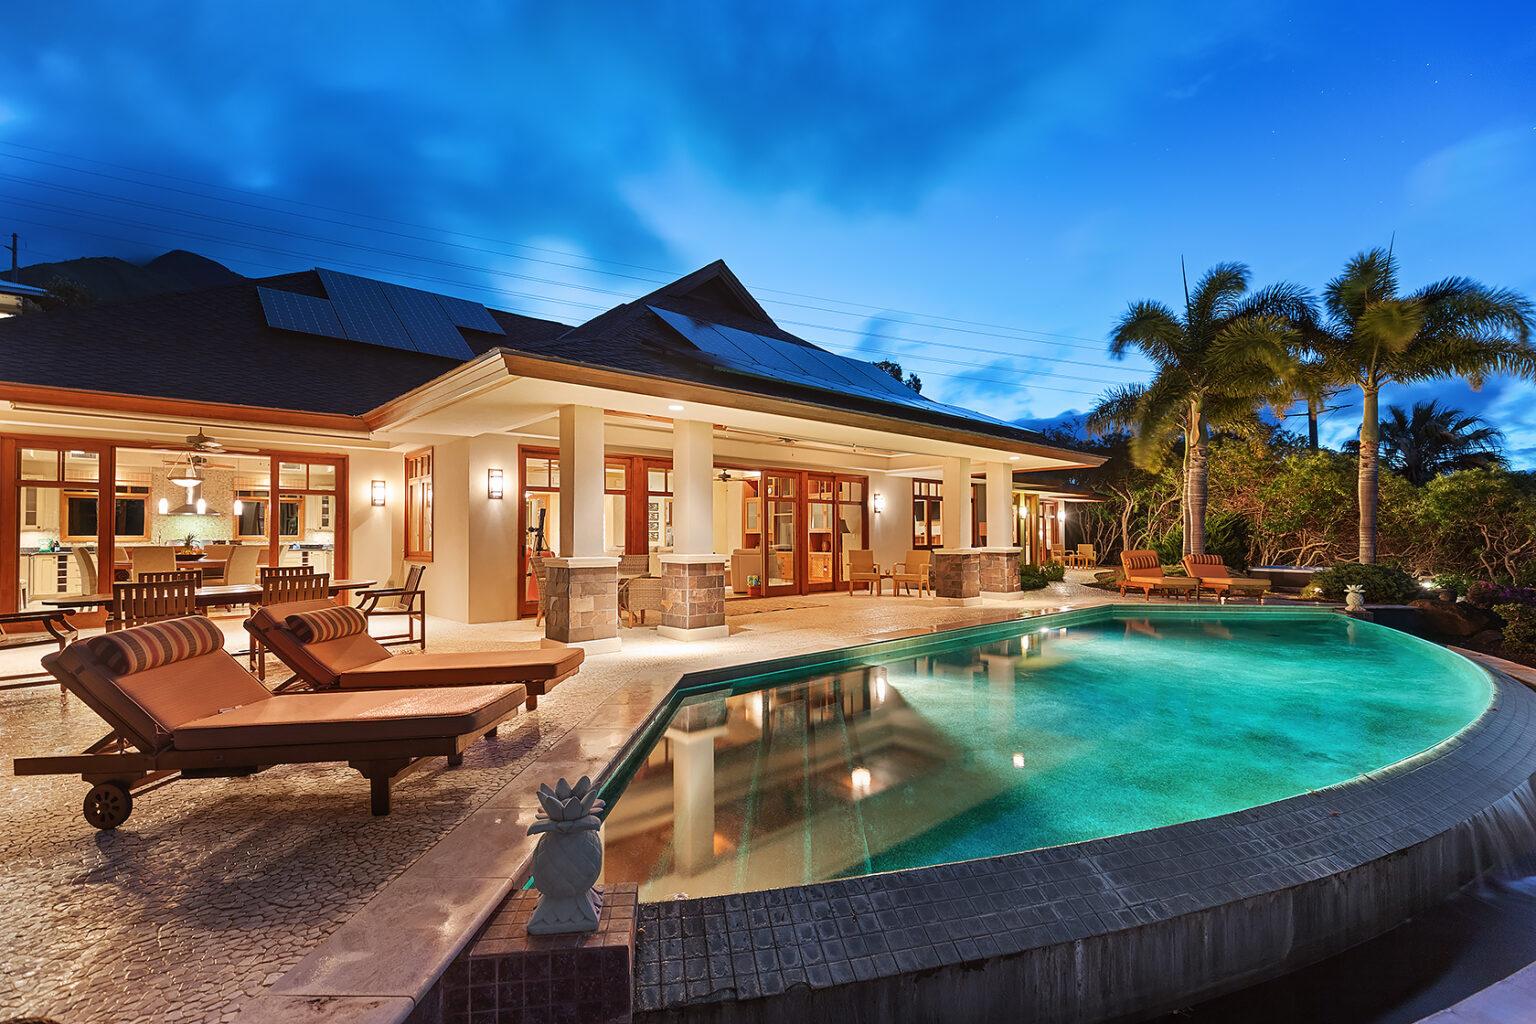 Maui Vacation Rental Photo Garuda